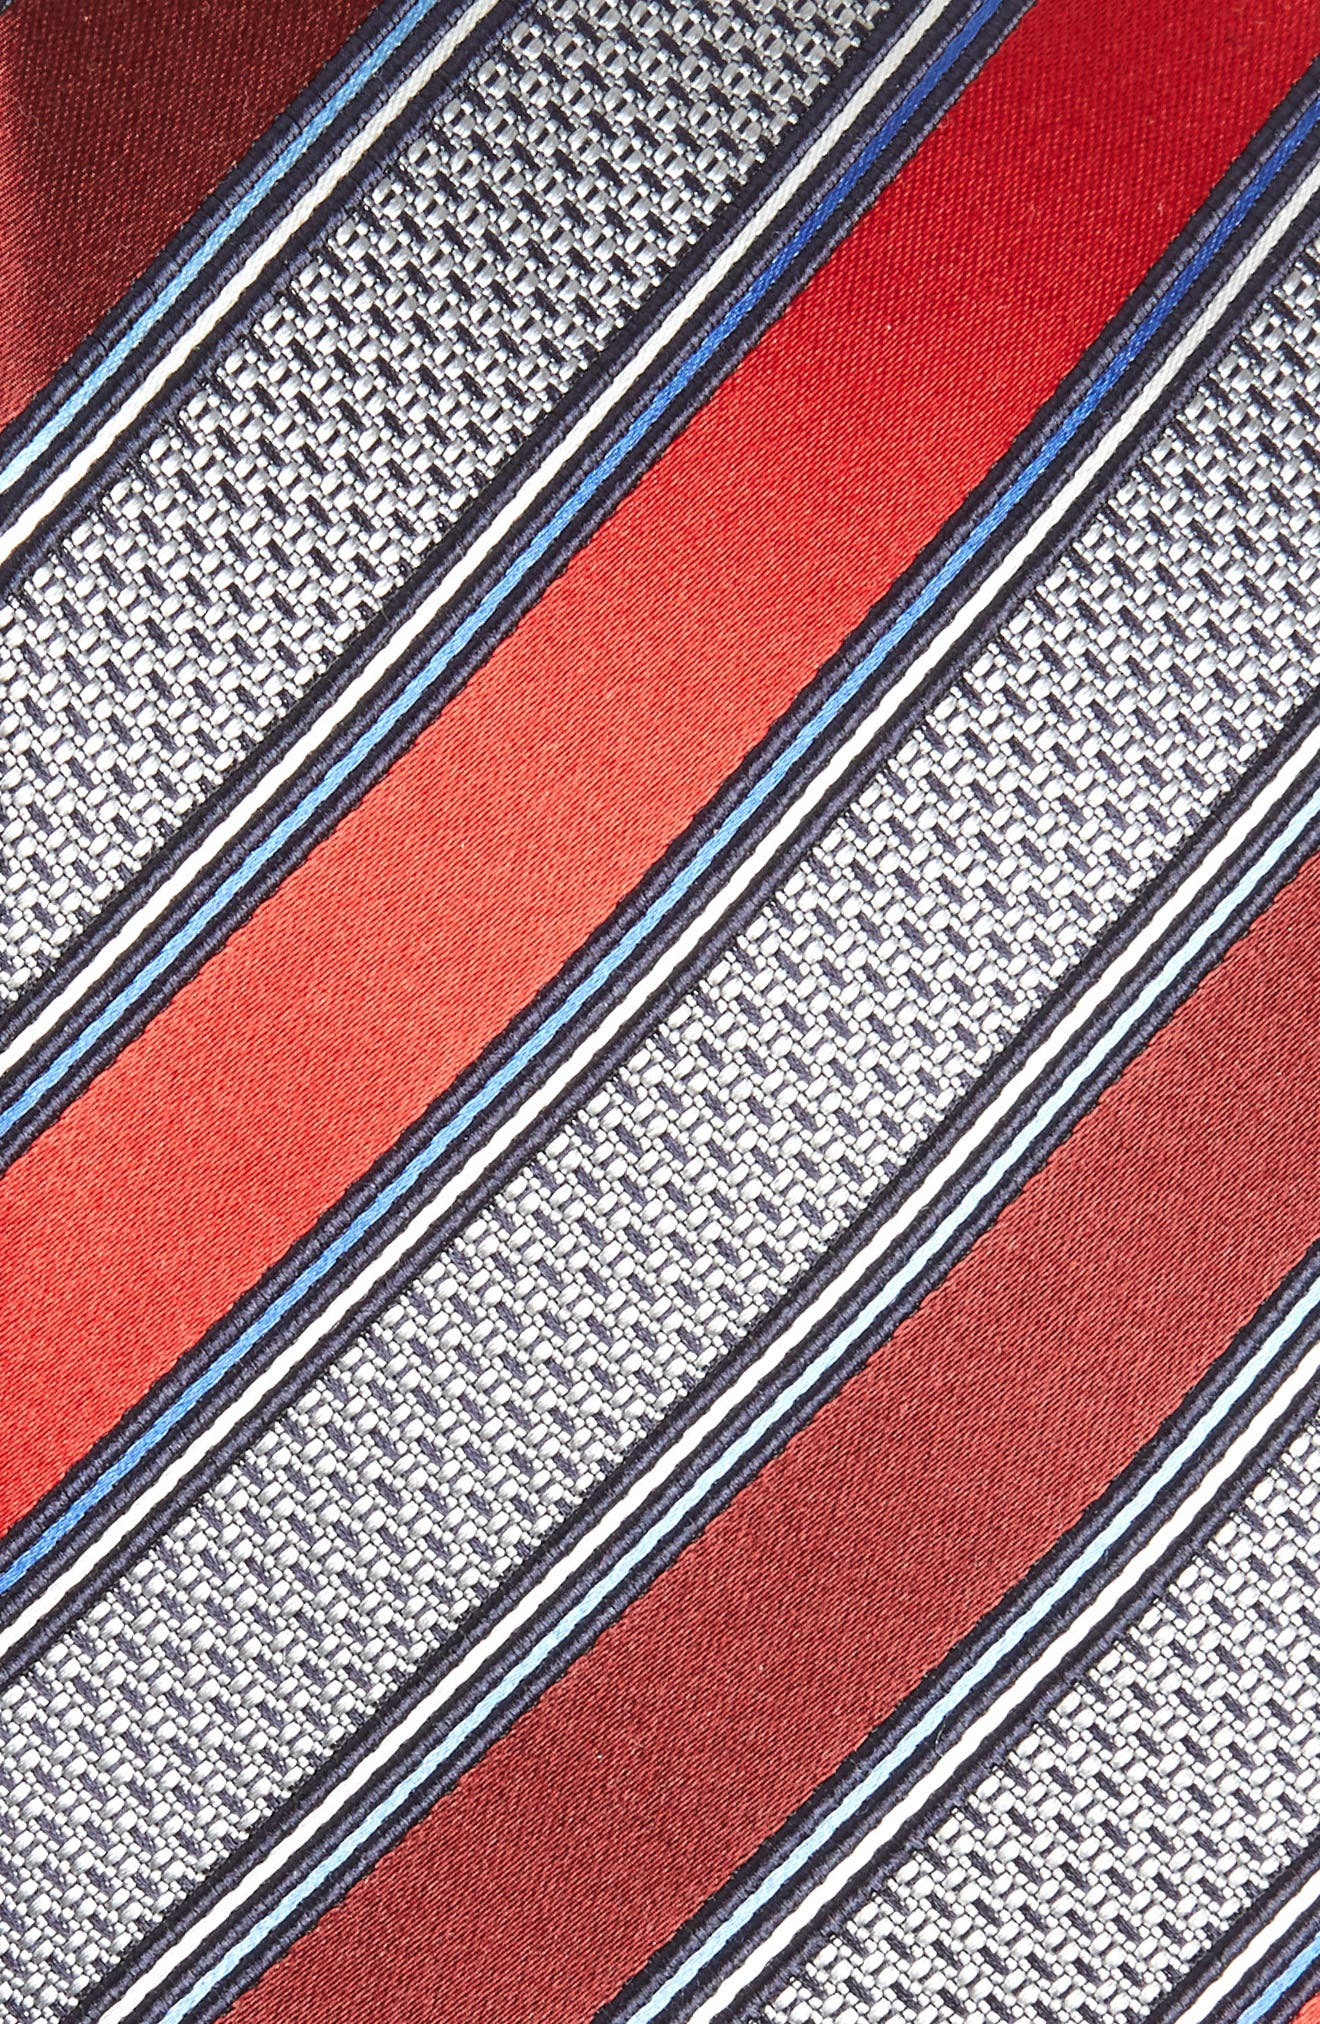 Stripe Silk & Cotton Tie,                             Alternate thumbnail 2, color,                             Red